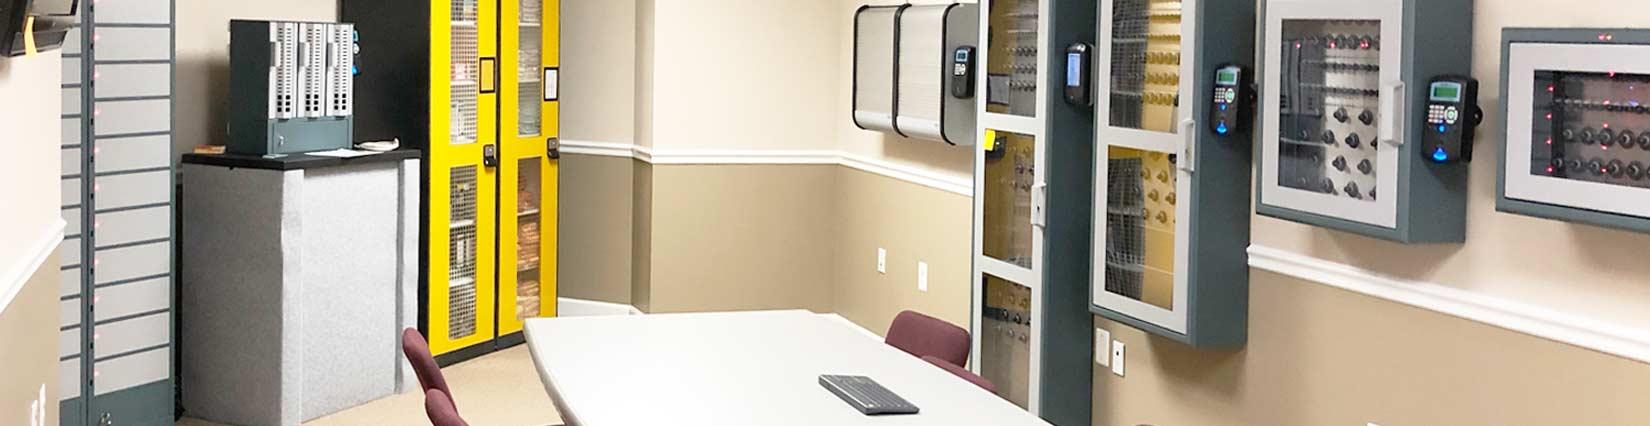 Electronic Key Cabinets Introduction